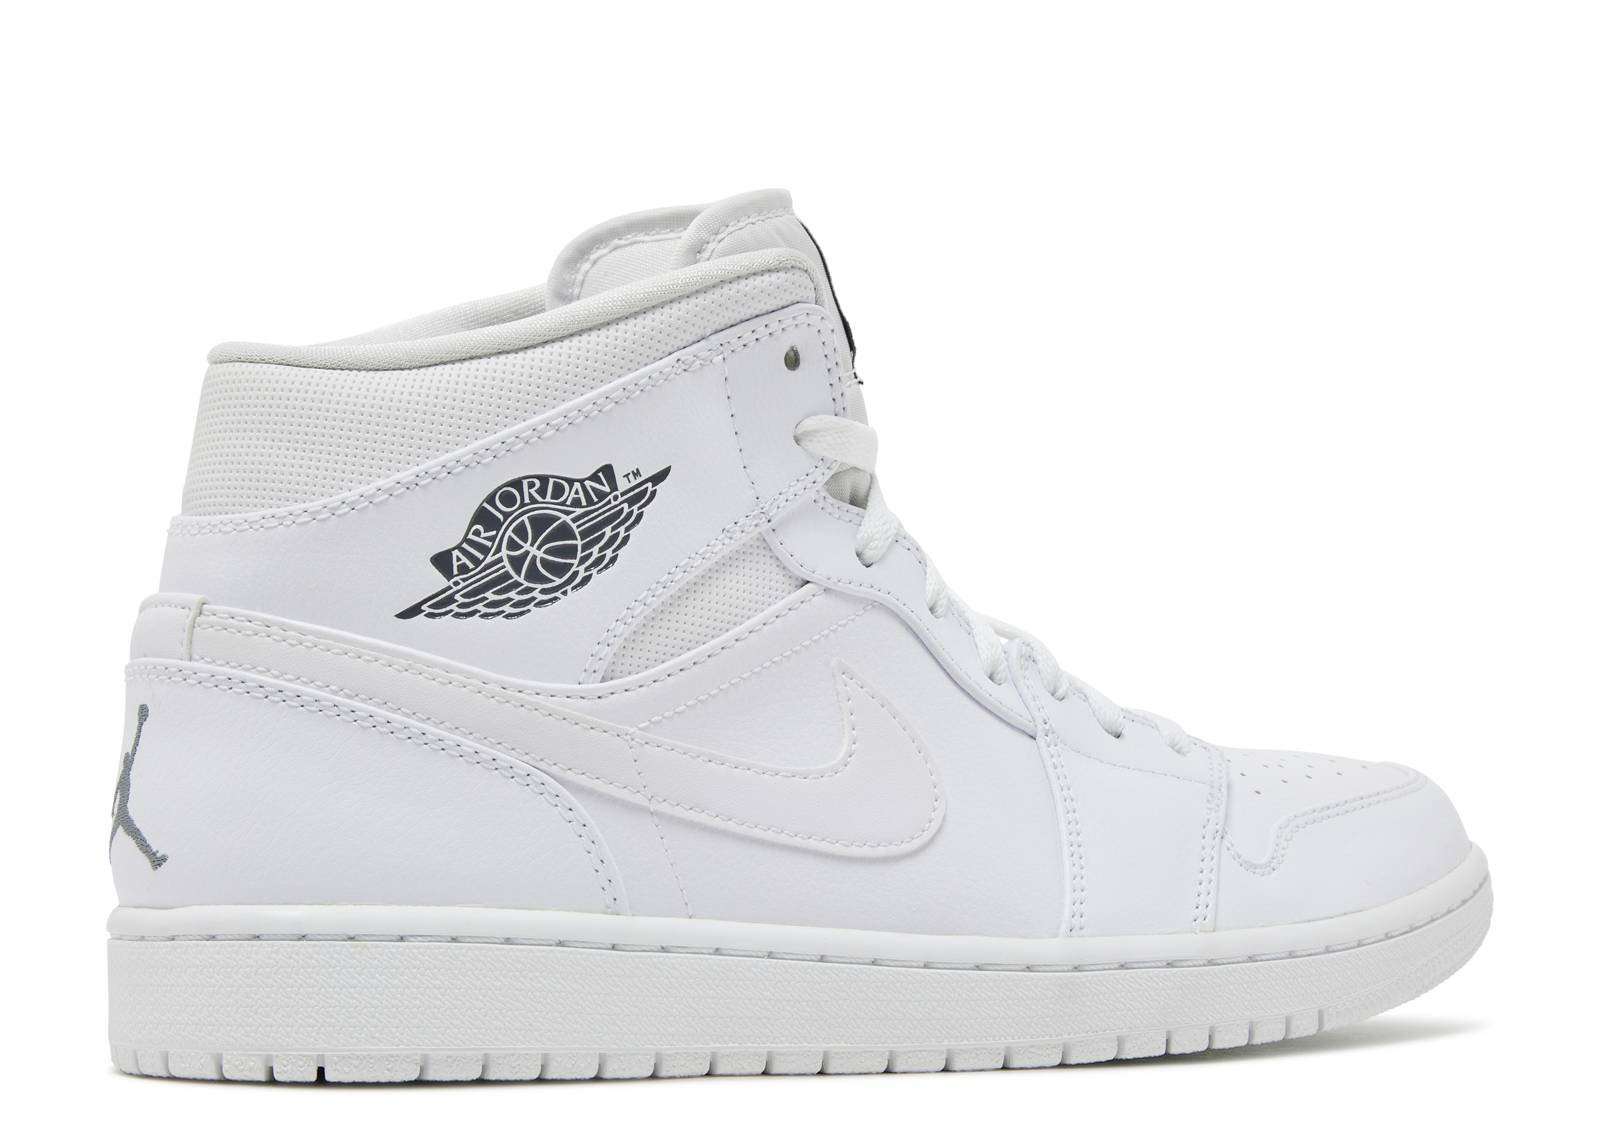 Air Jordan 1 Mid White